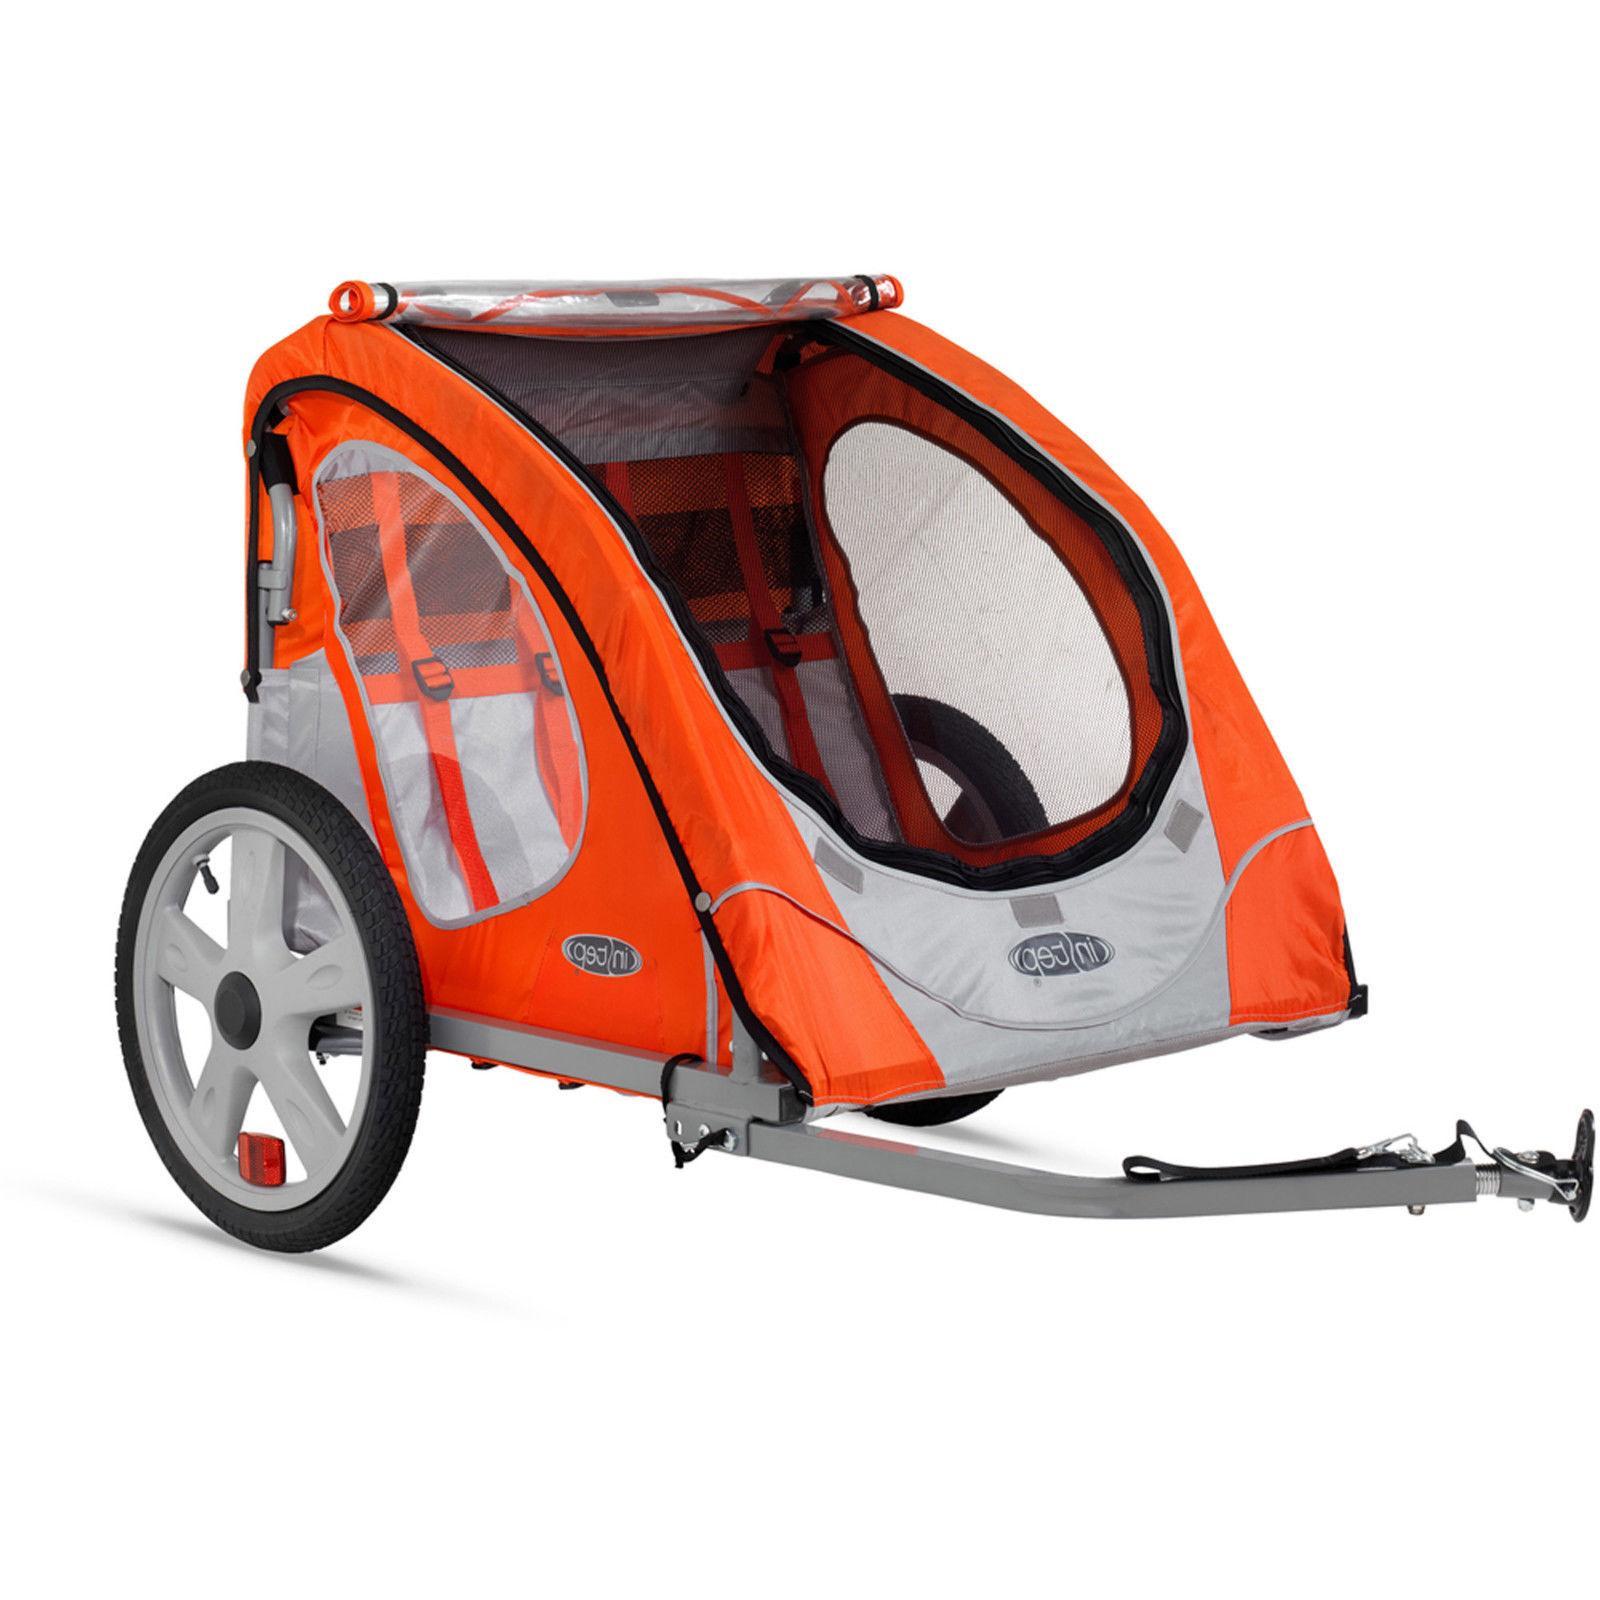 NEW Bike Trailer InStep 2 Seat Child Bicycle